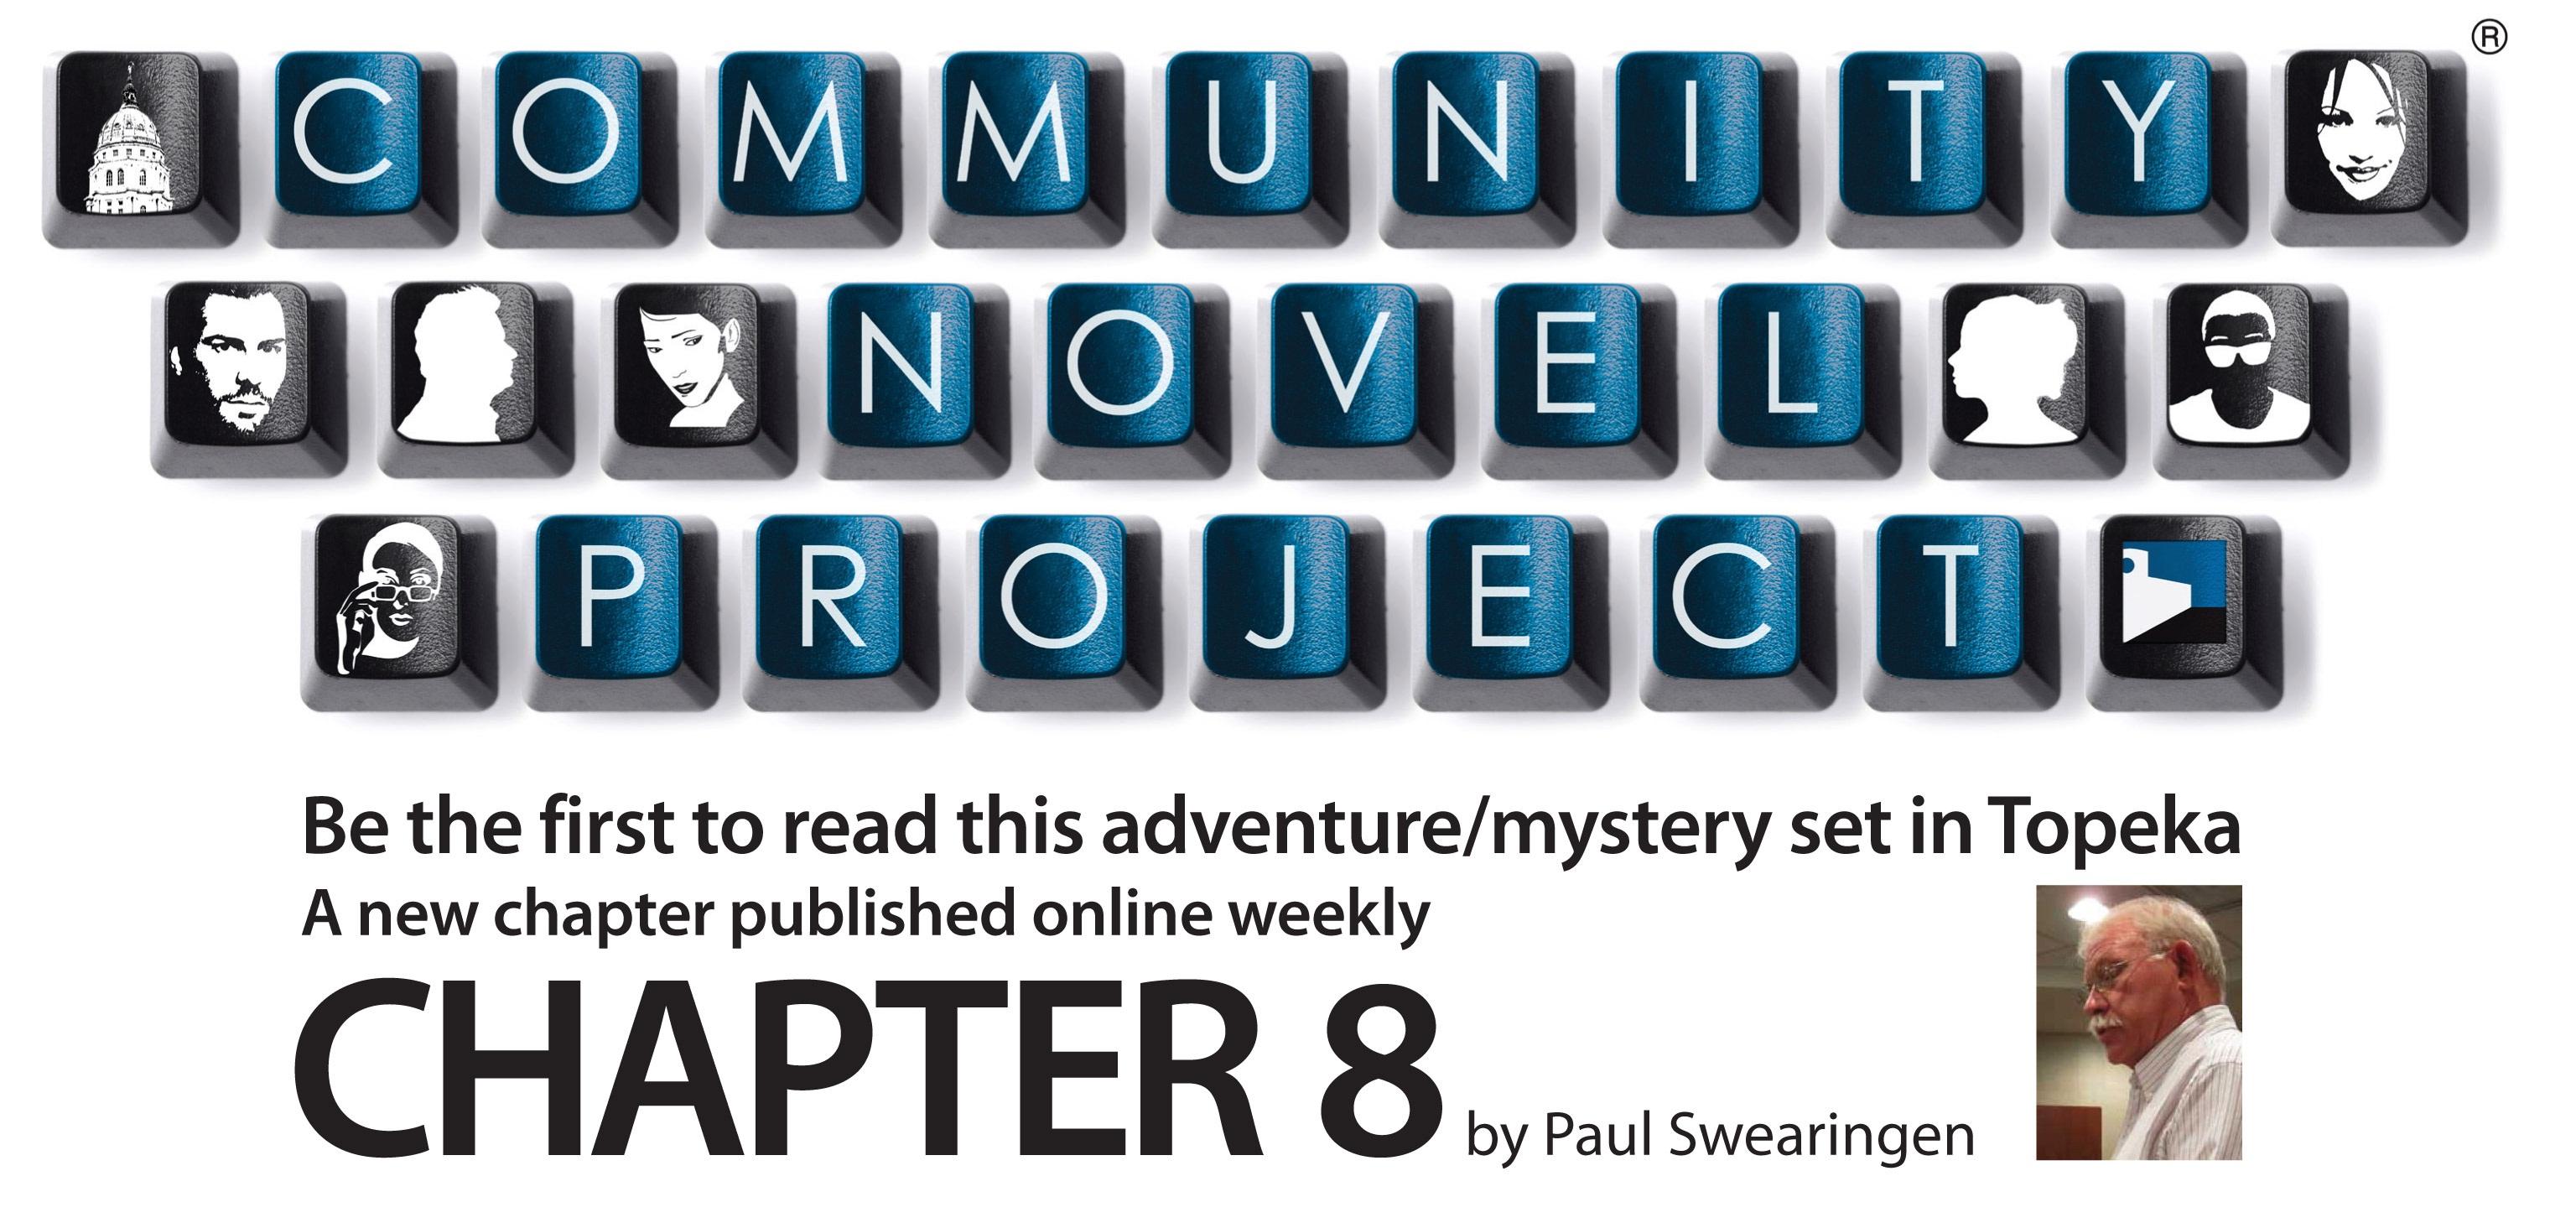 community-novel-chapter-8